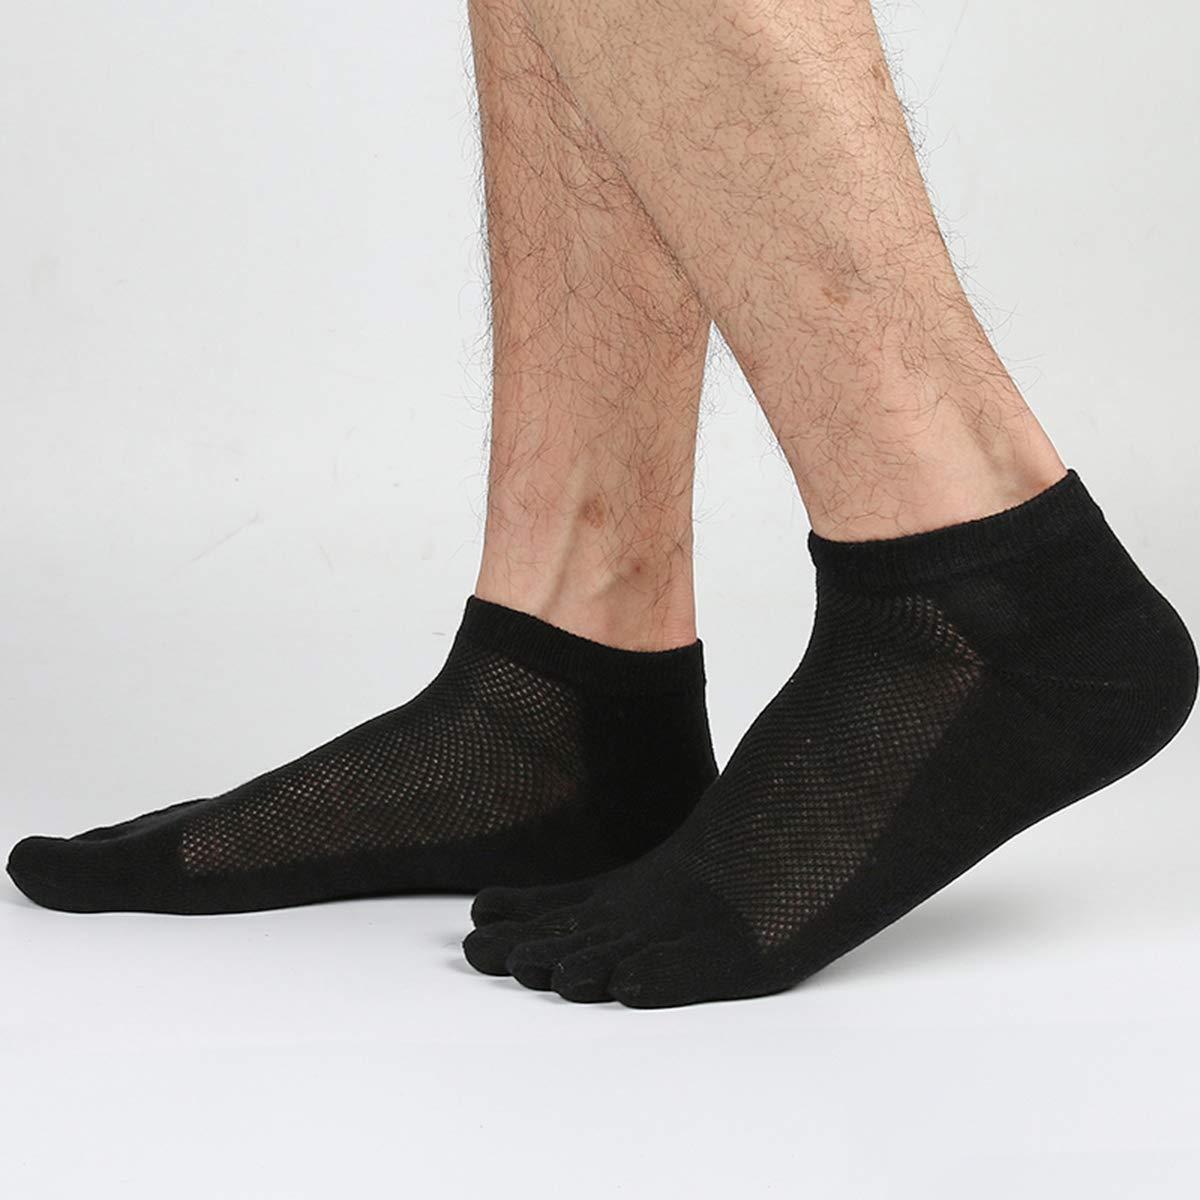 Mens Toe Socks 5 Finger Cotton Mesh Wicking//Striped Crew,Low Cut 4//5 Pack